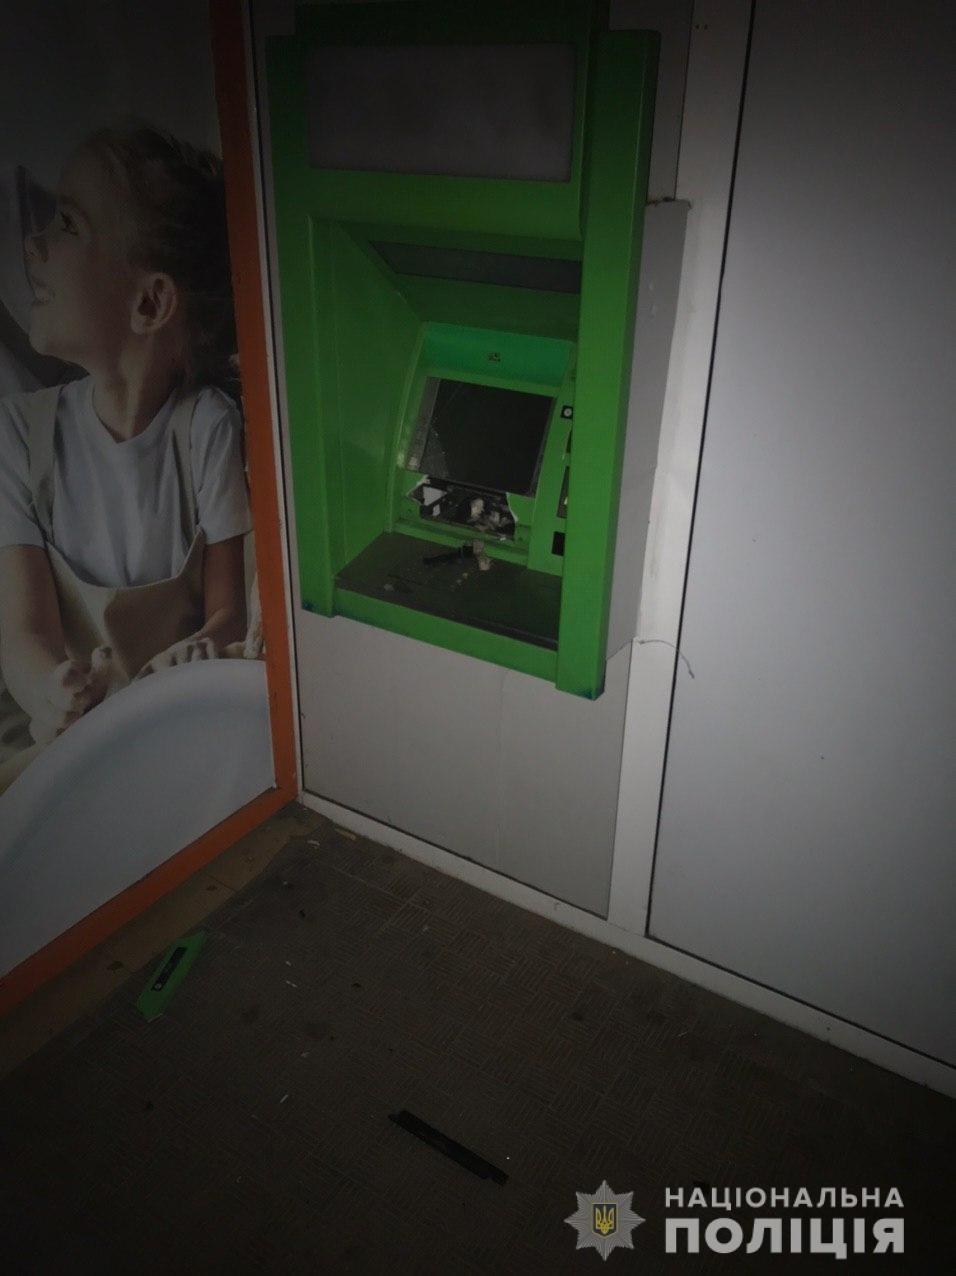 В Харькове неизвестные взорвали банкомат, находящийся в супермаркете, - ФОТО, фото-1